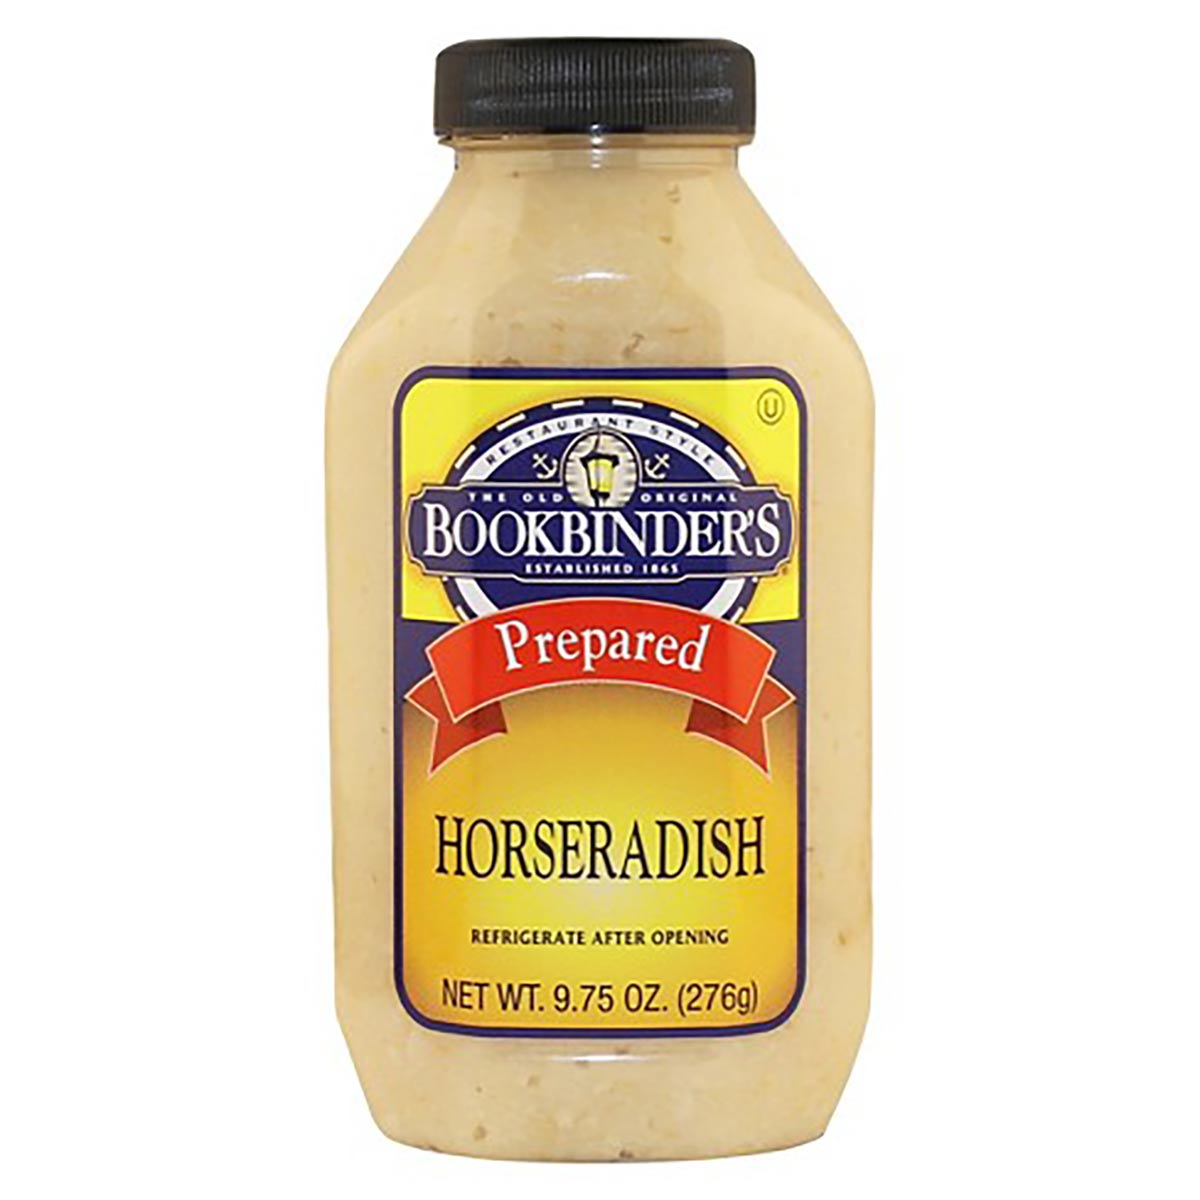 bookbinders prepared horseradish